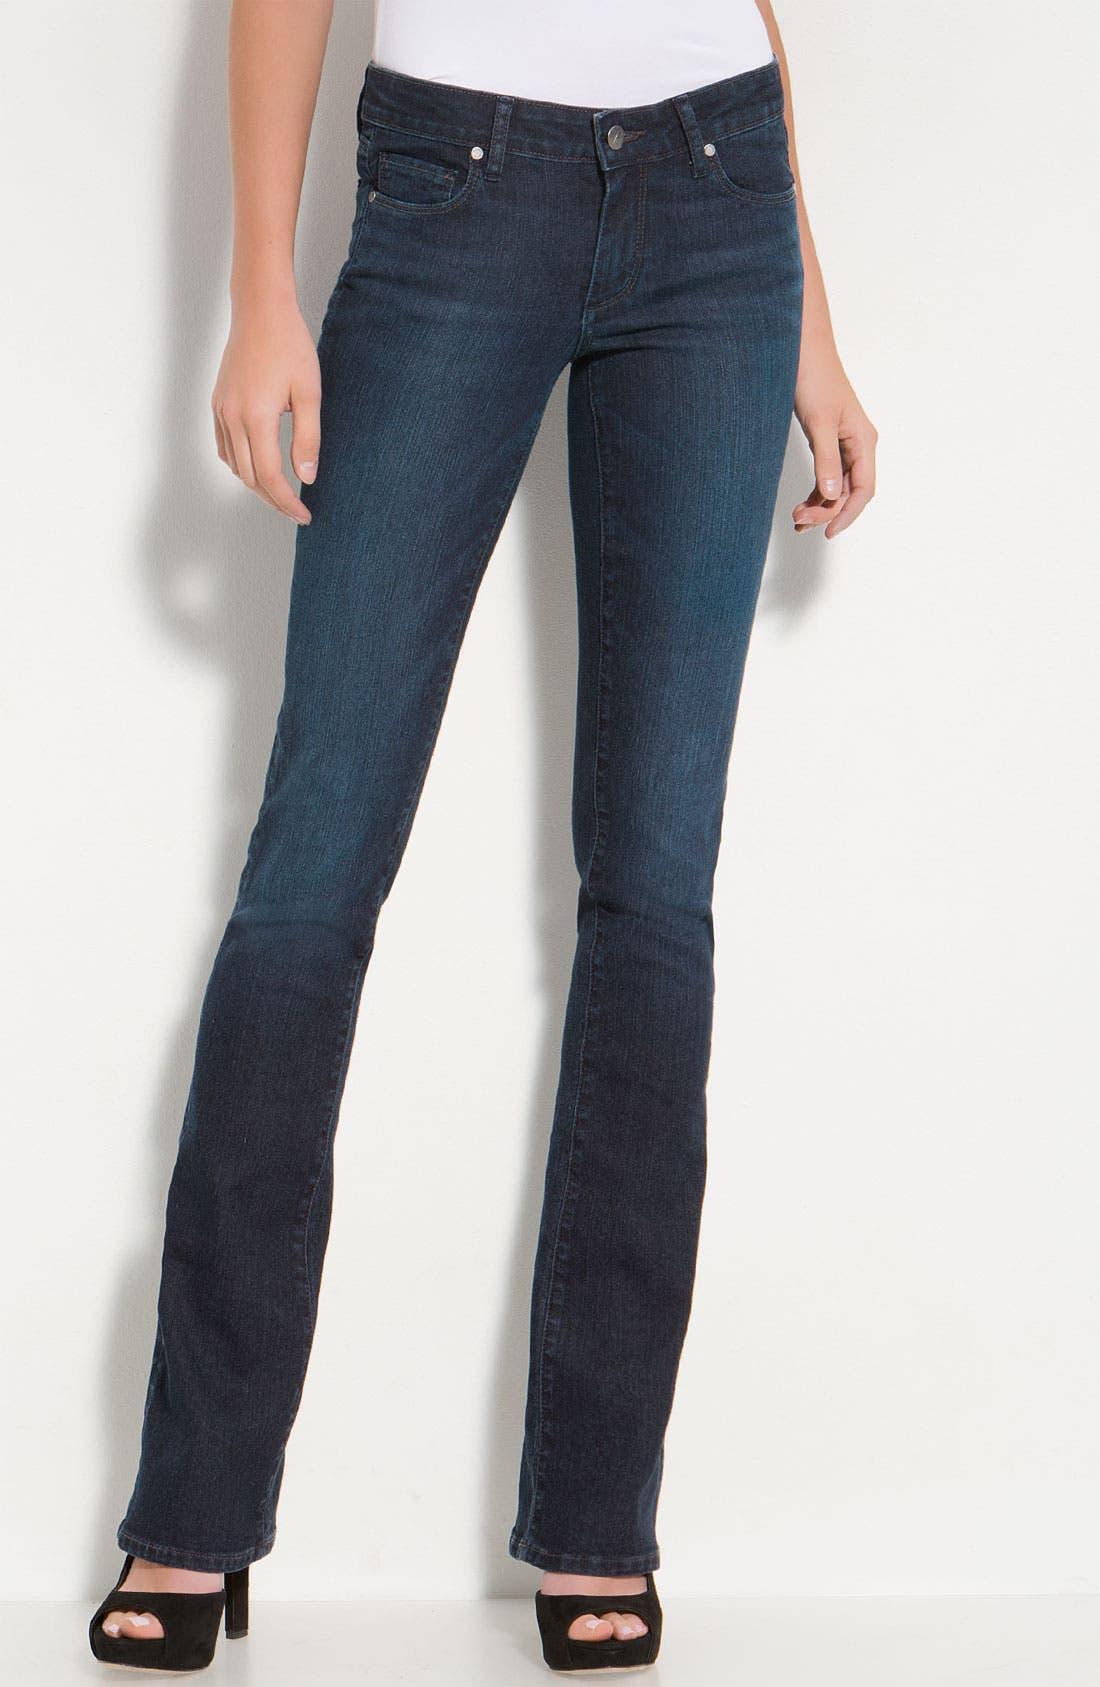 Paige Denim 'Laguna Baby' Bootcut Jeans (Lighthouse Wash) | Nordstrom